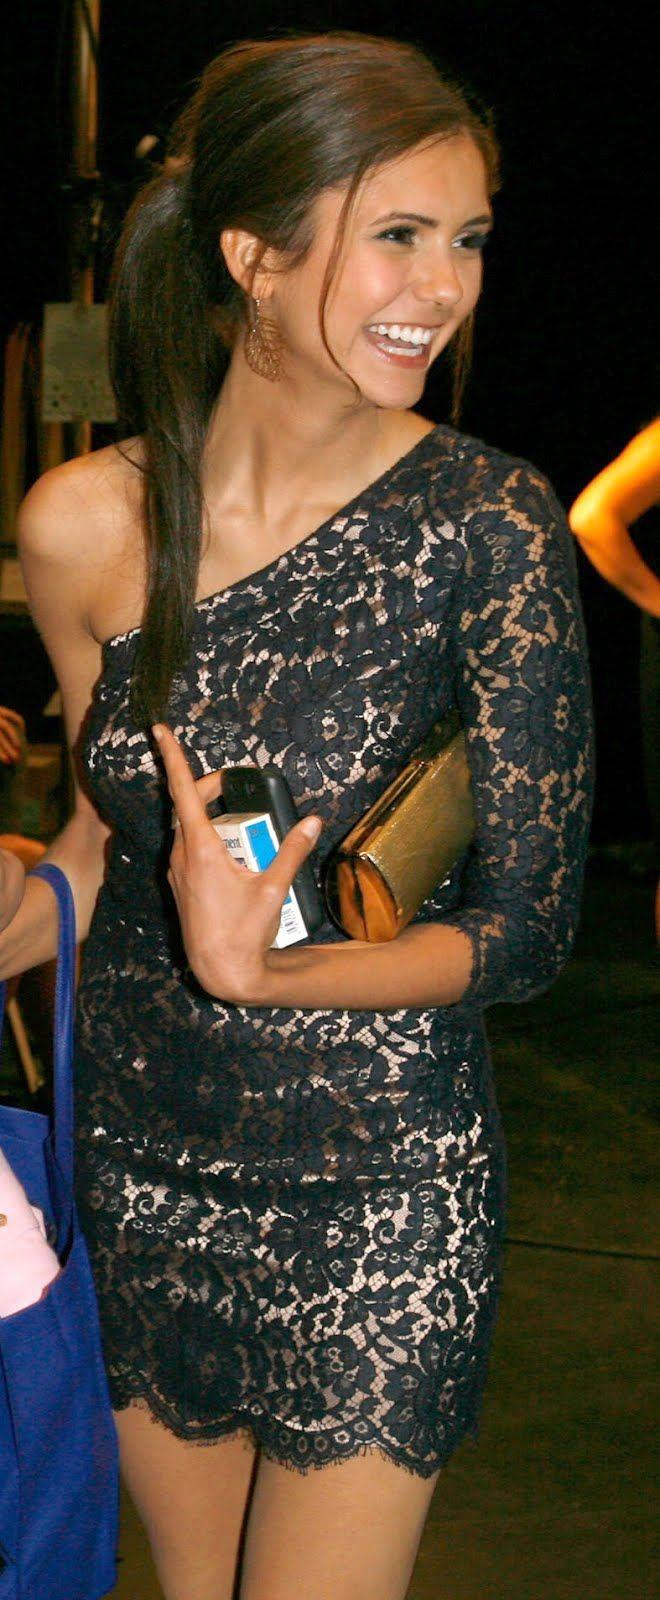 <3 her dress .